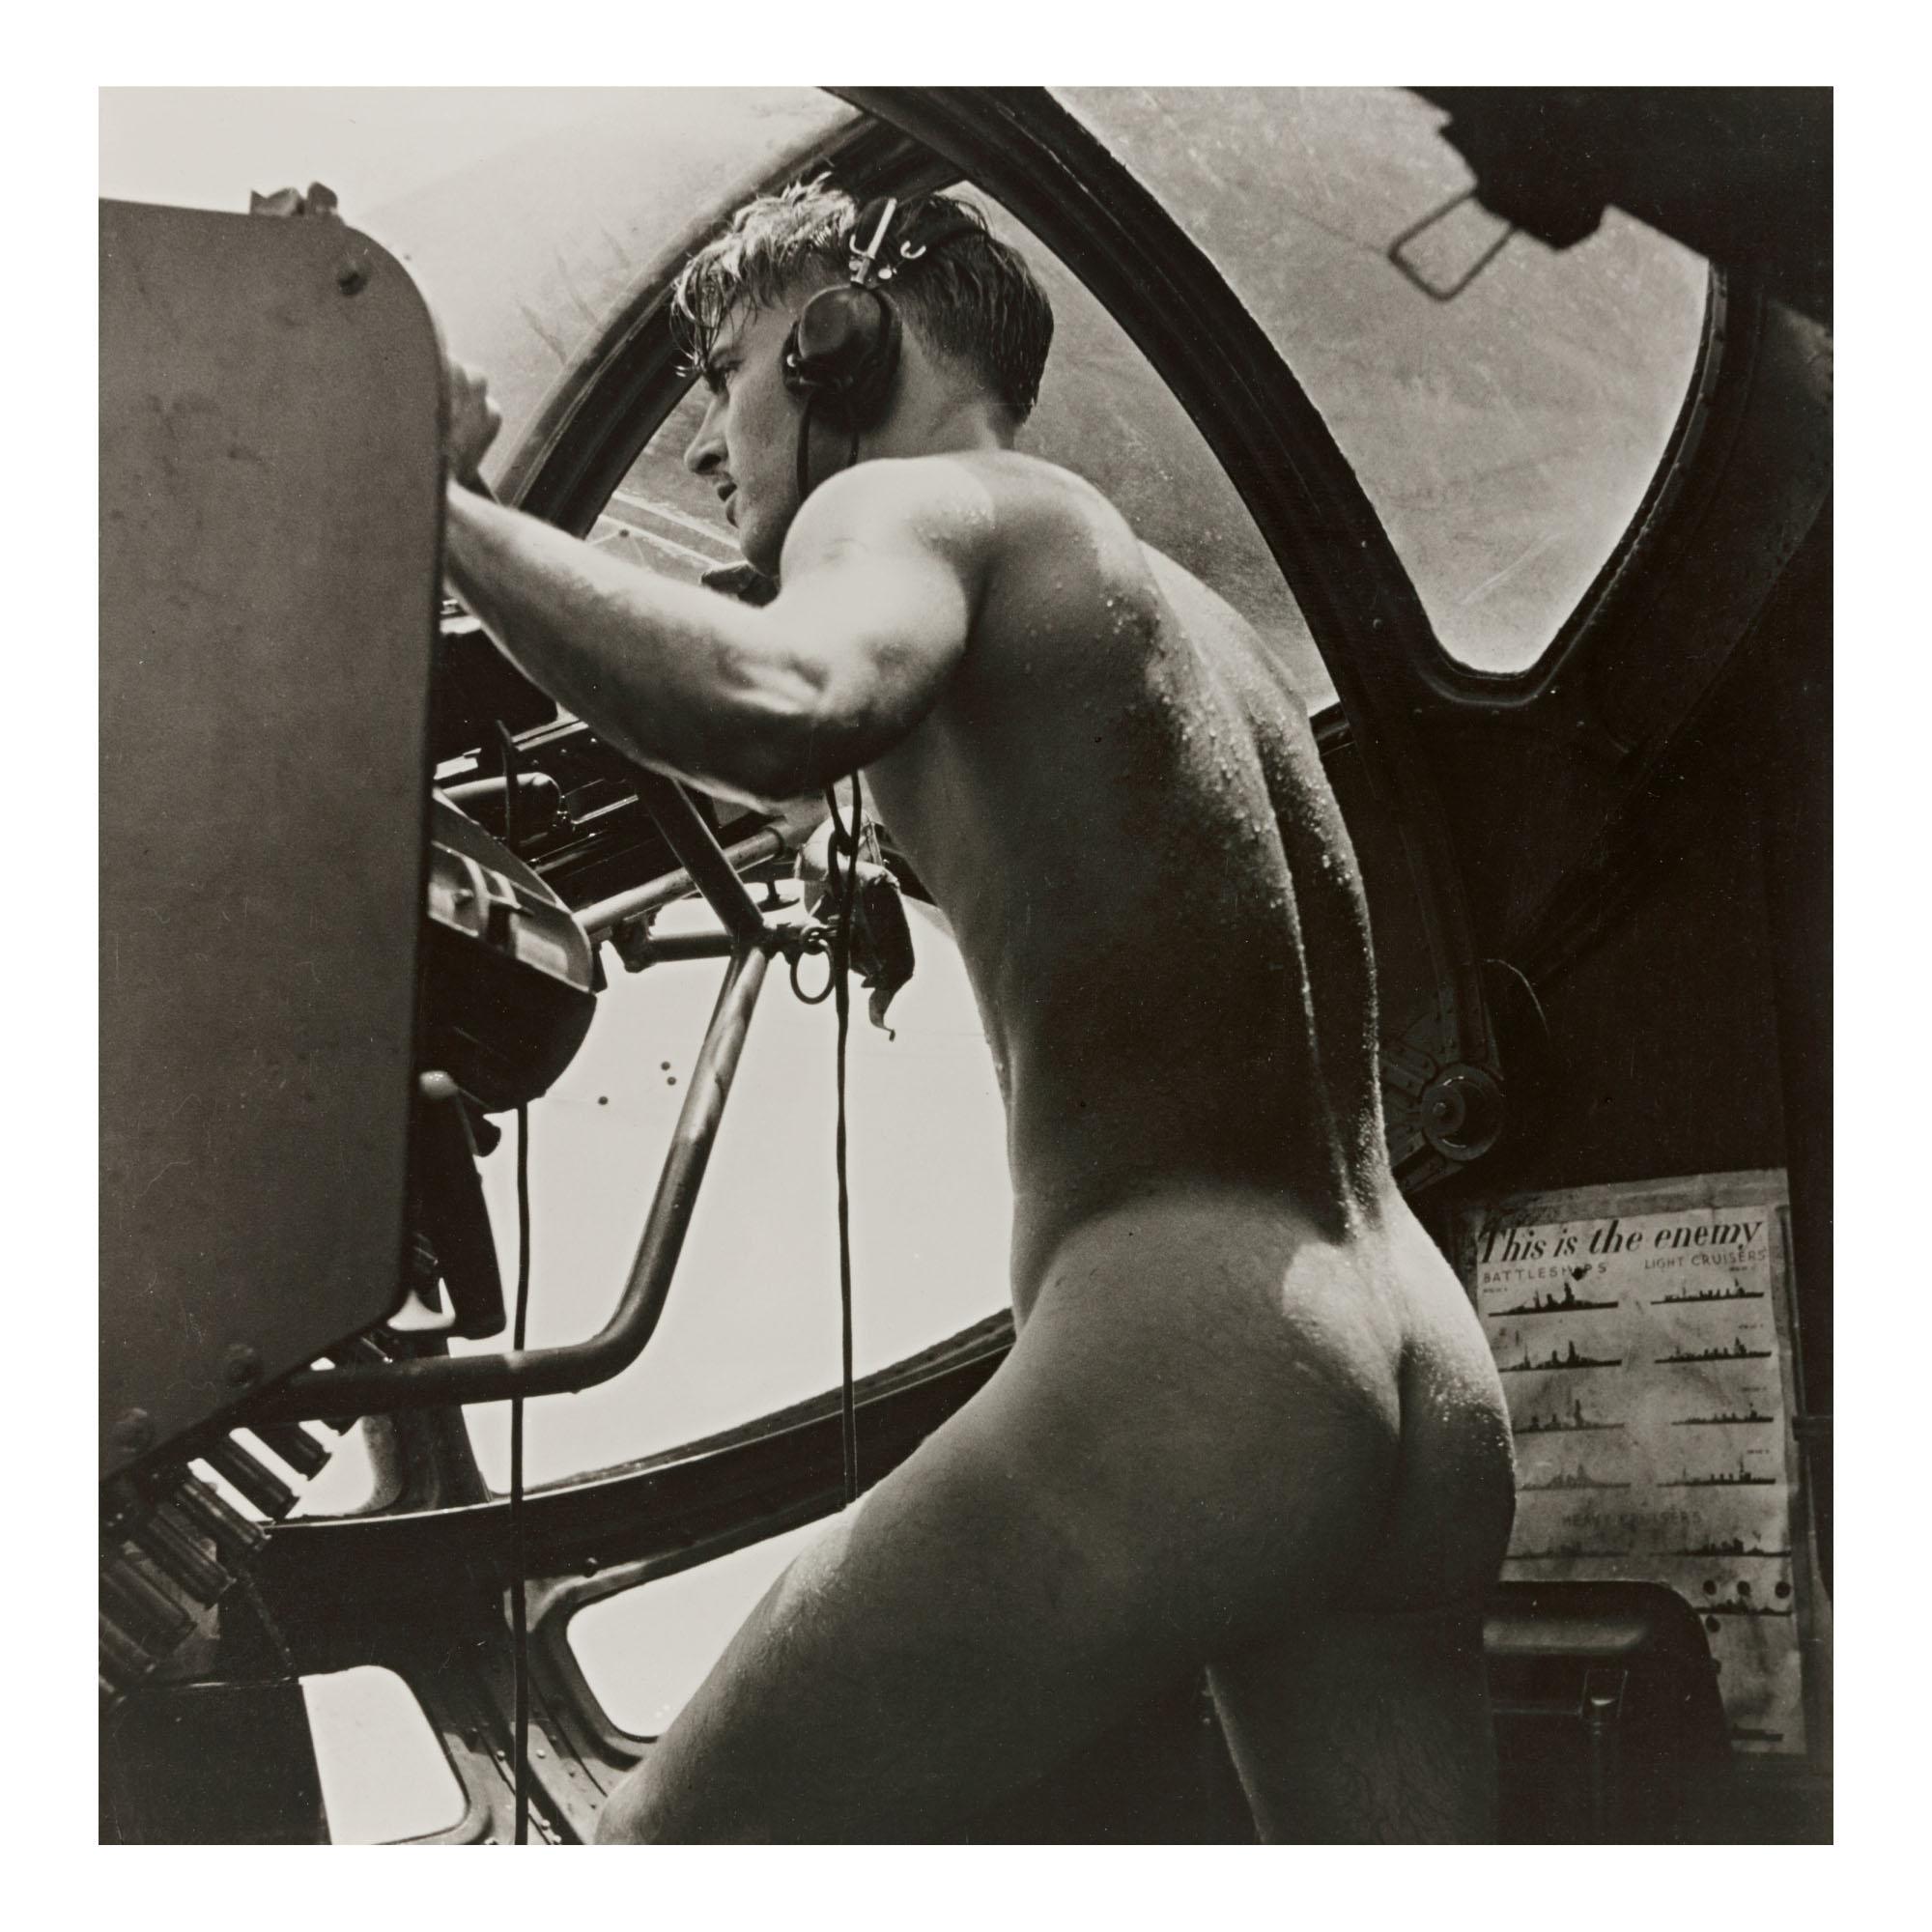 HORACE BRISTOL | PBY BLISTER GUNNER, RESCUE AT RABAUL